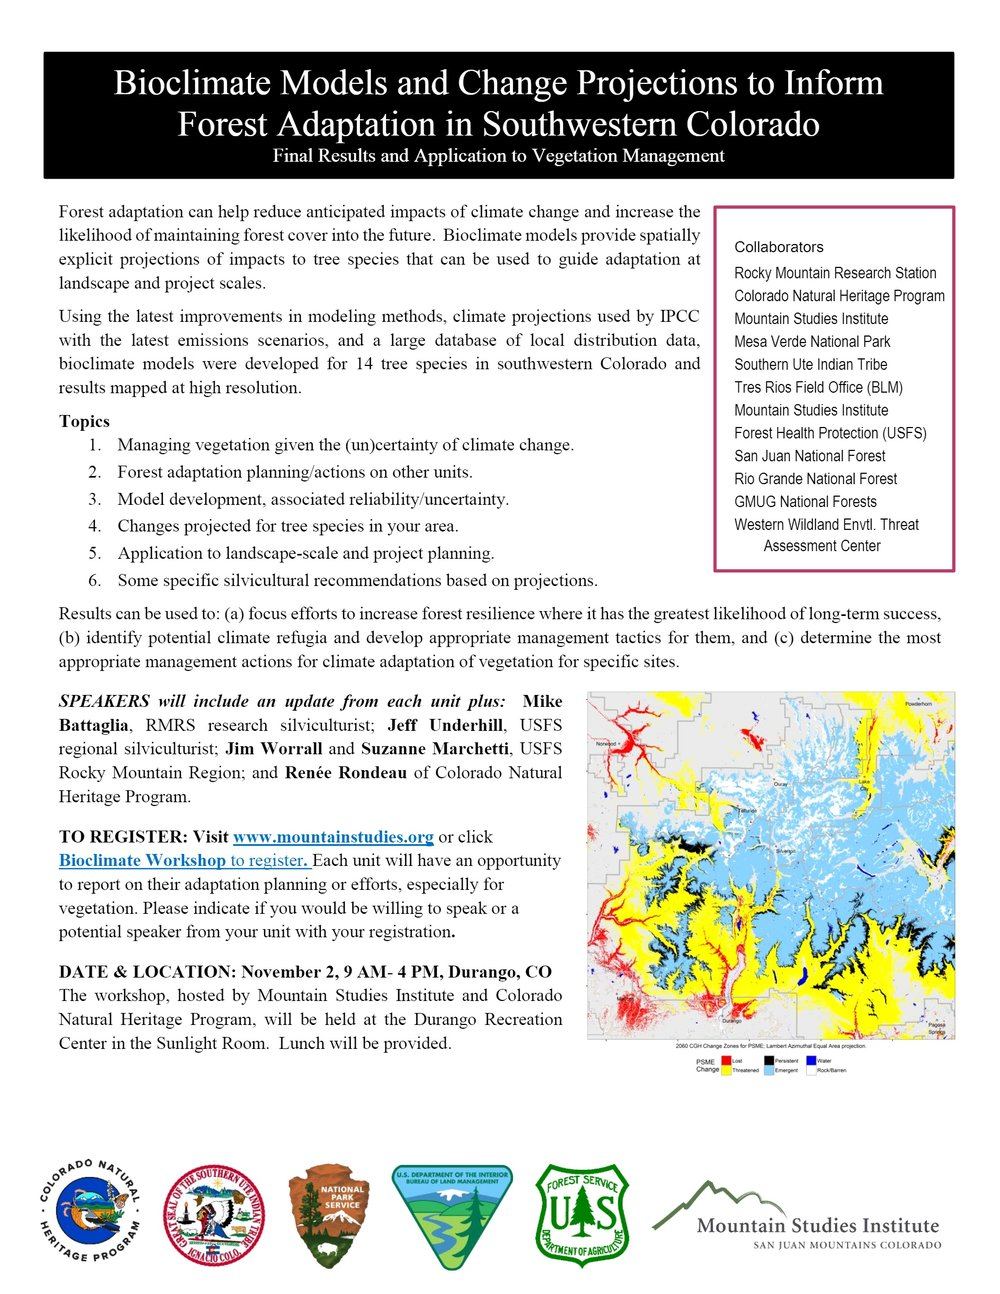 jpg bioclimate flyer.jpg